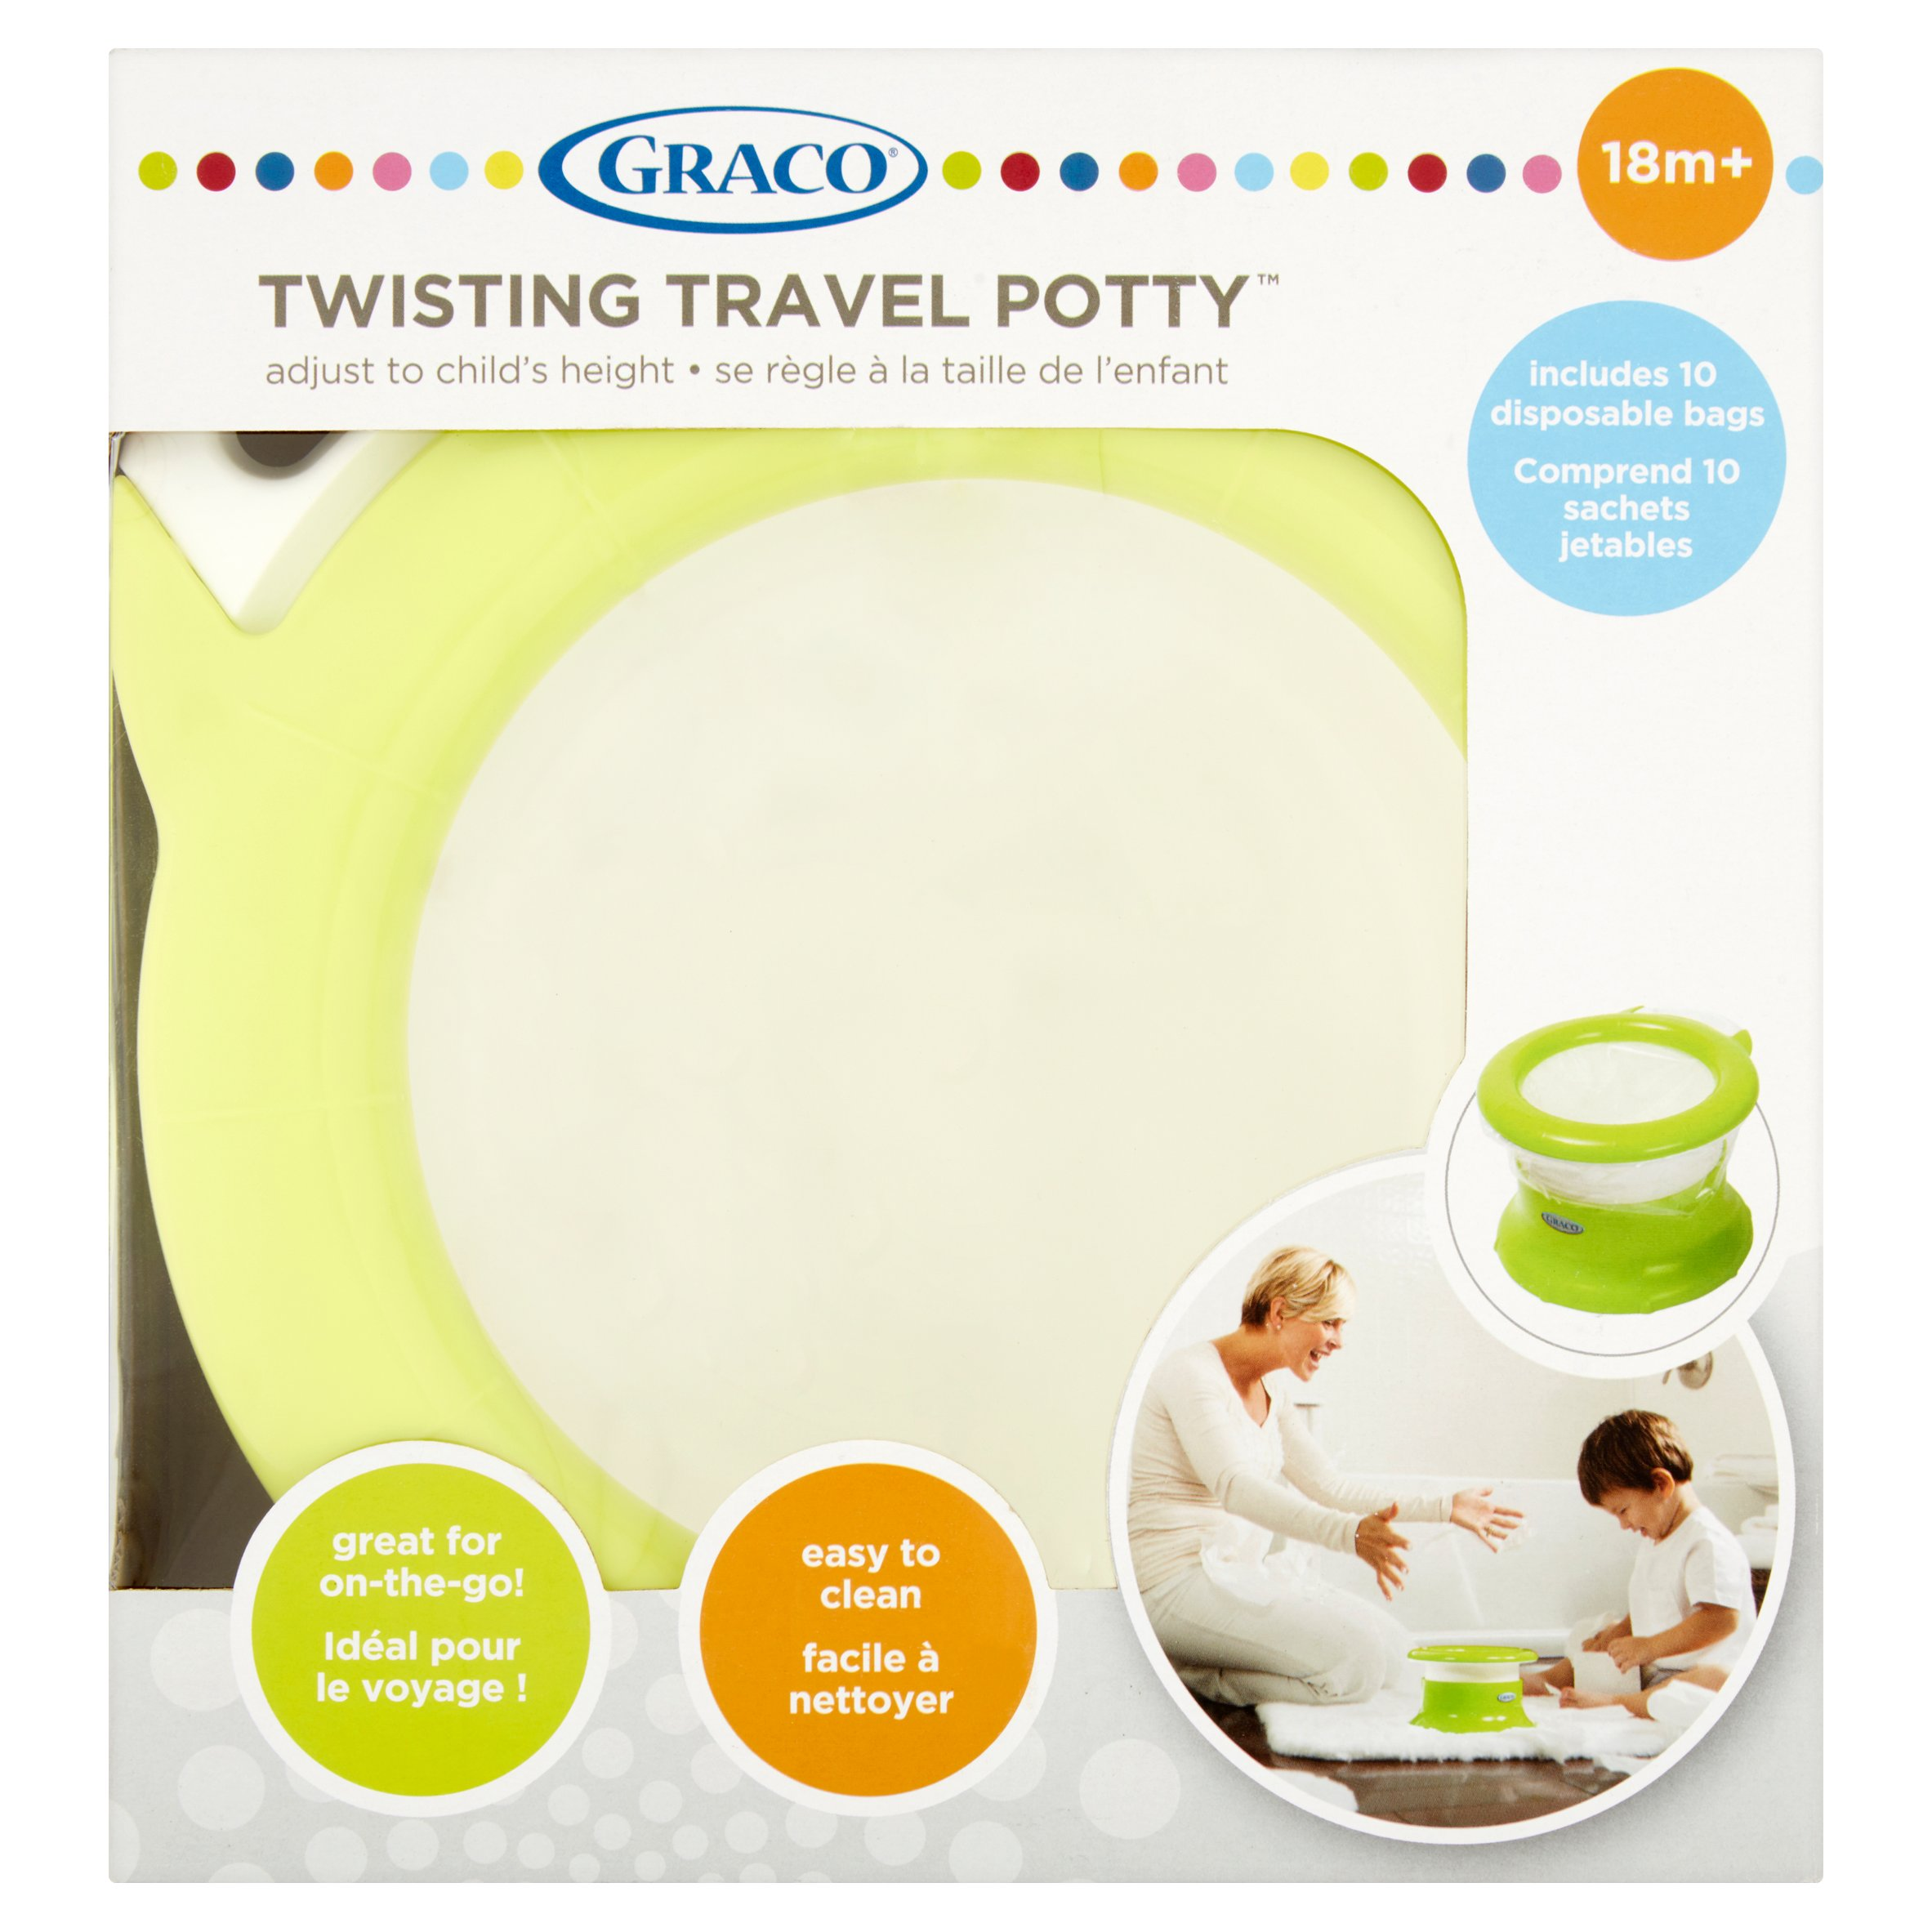 Graco Twisting Travel Potty 18m+